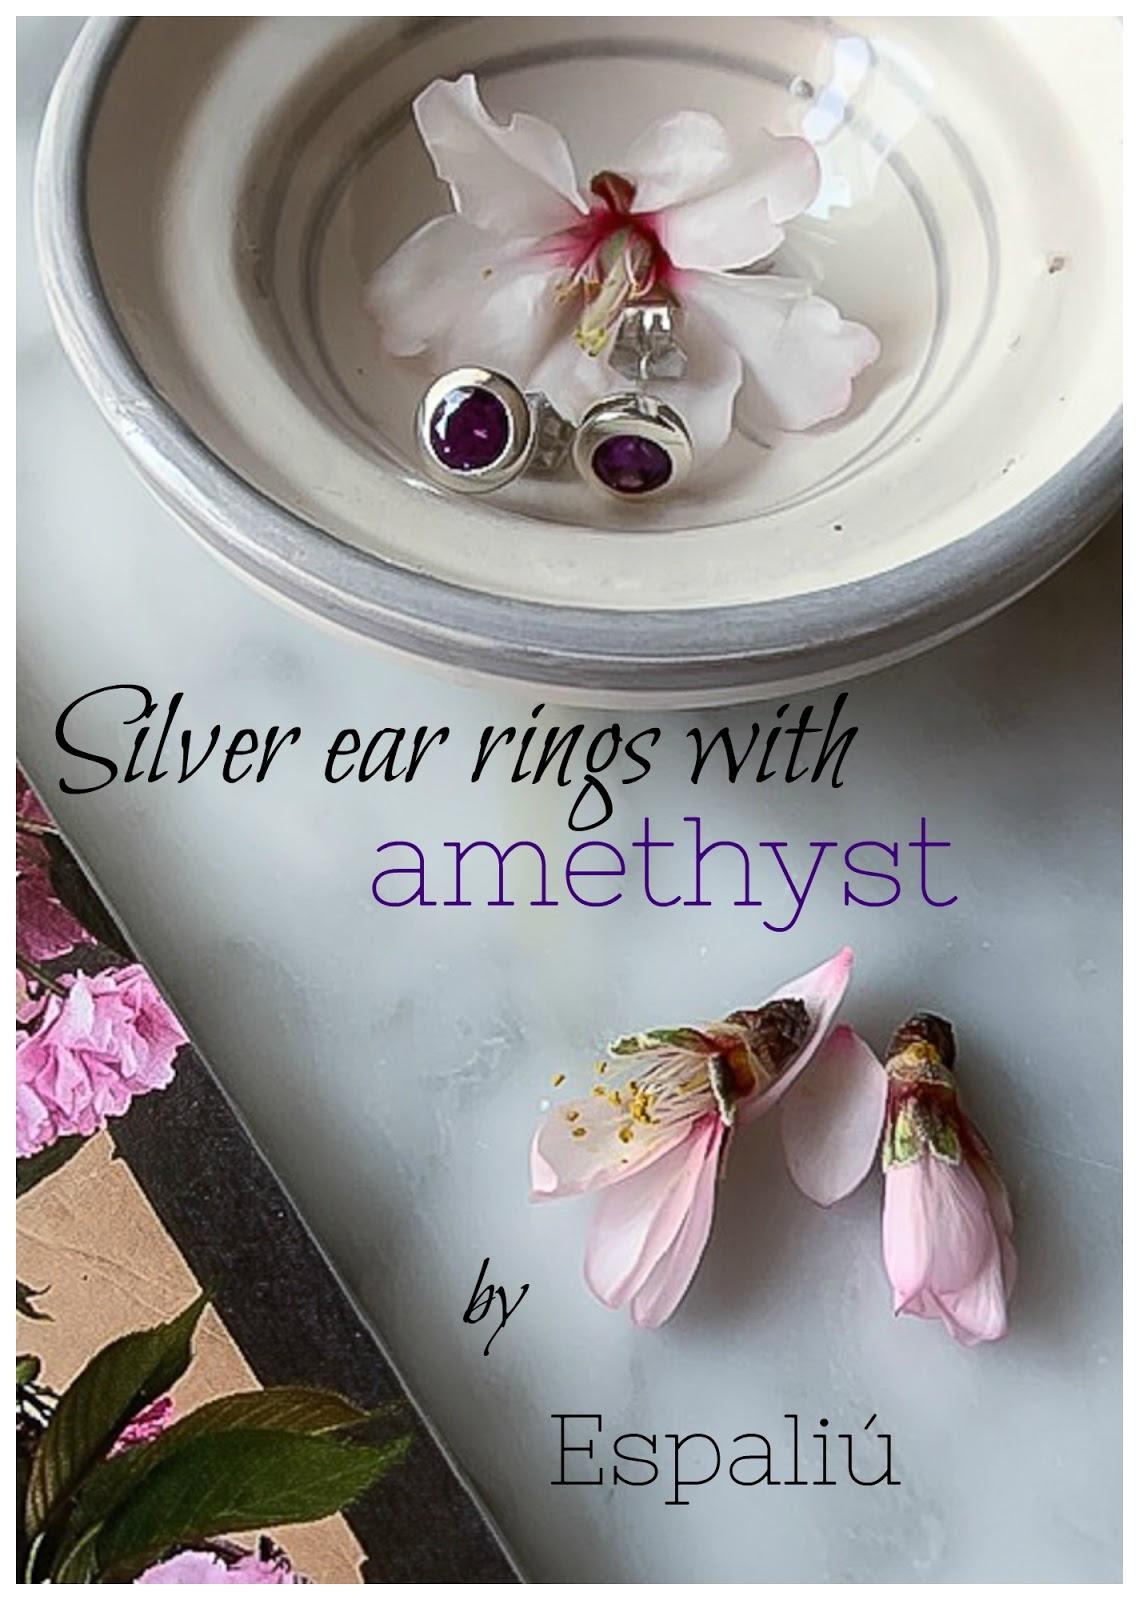 Espaliu silver earrings with amethyst